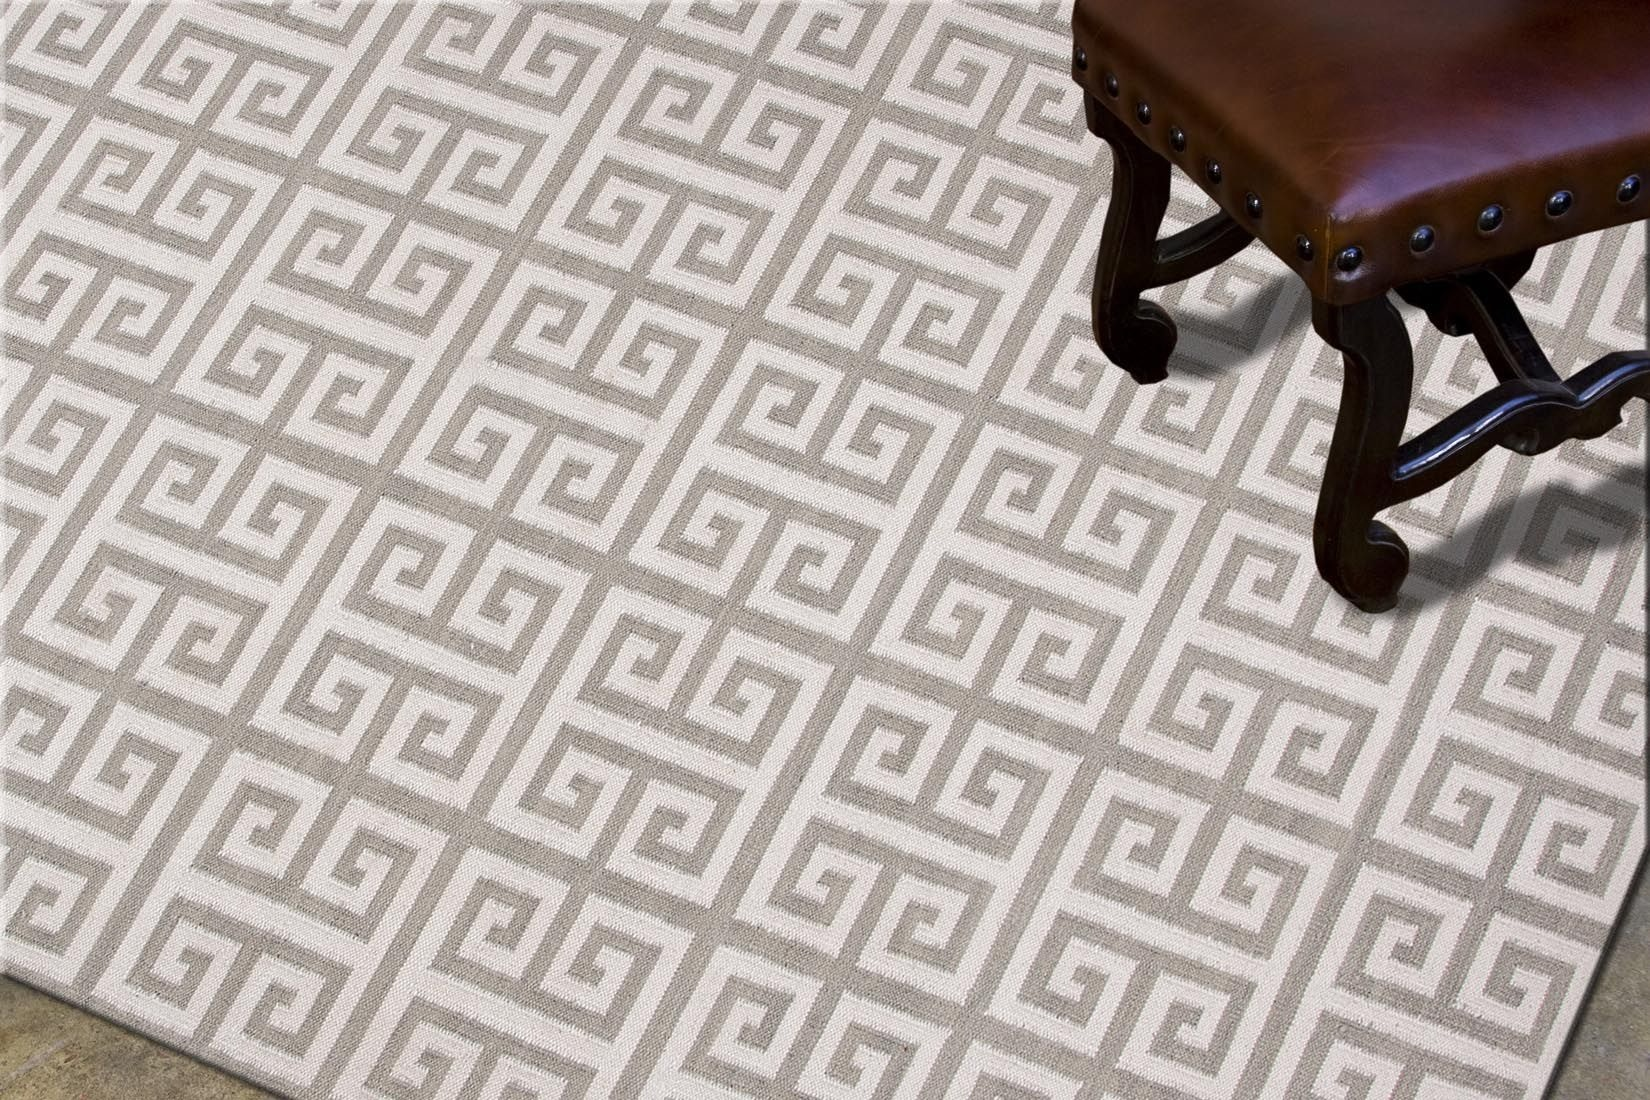 jaipur rugs flatweave geometric pattern wool ivorygray area rug 9x12